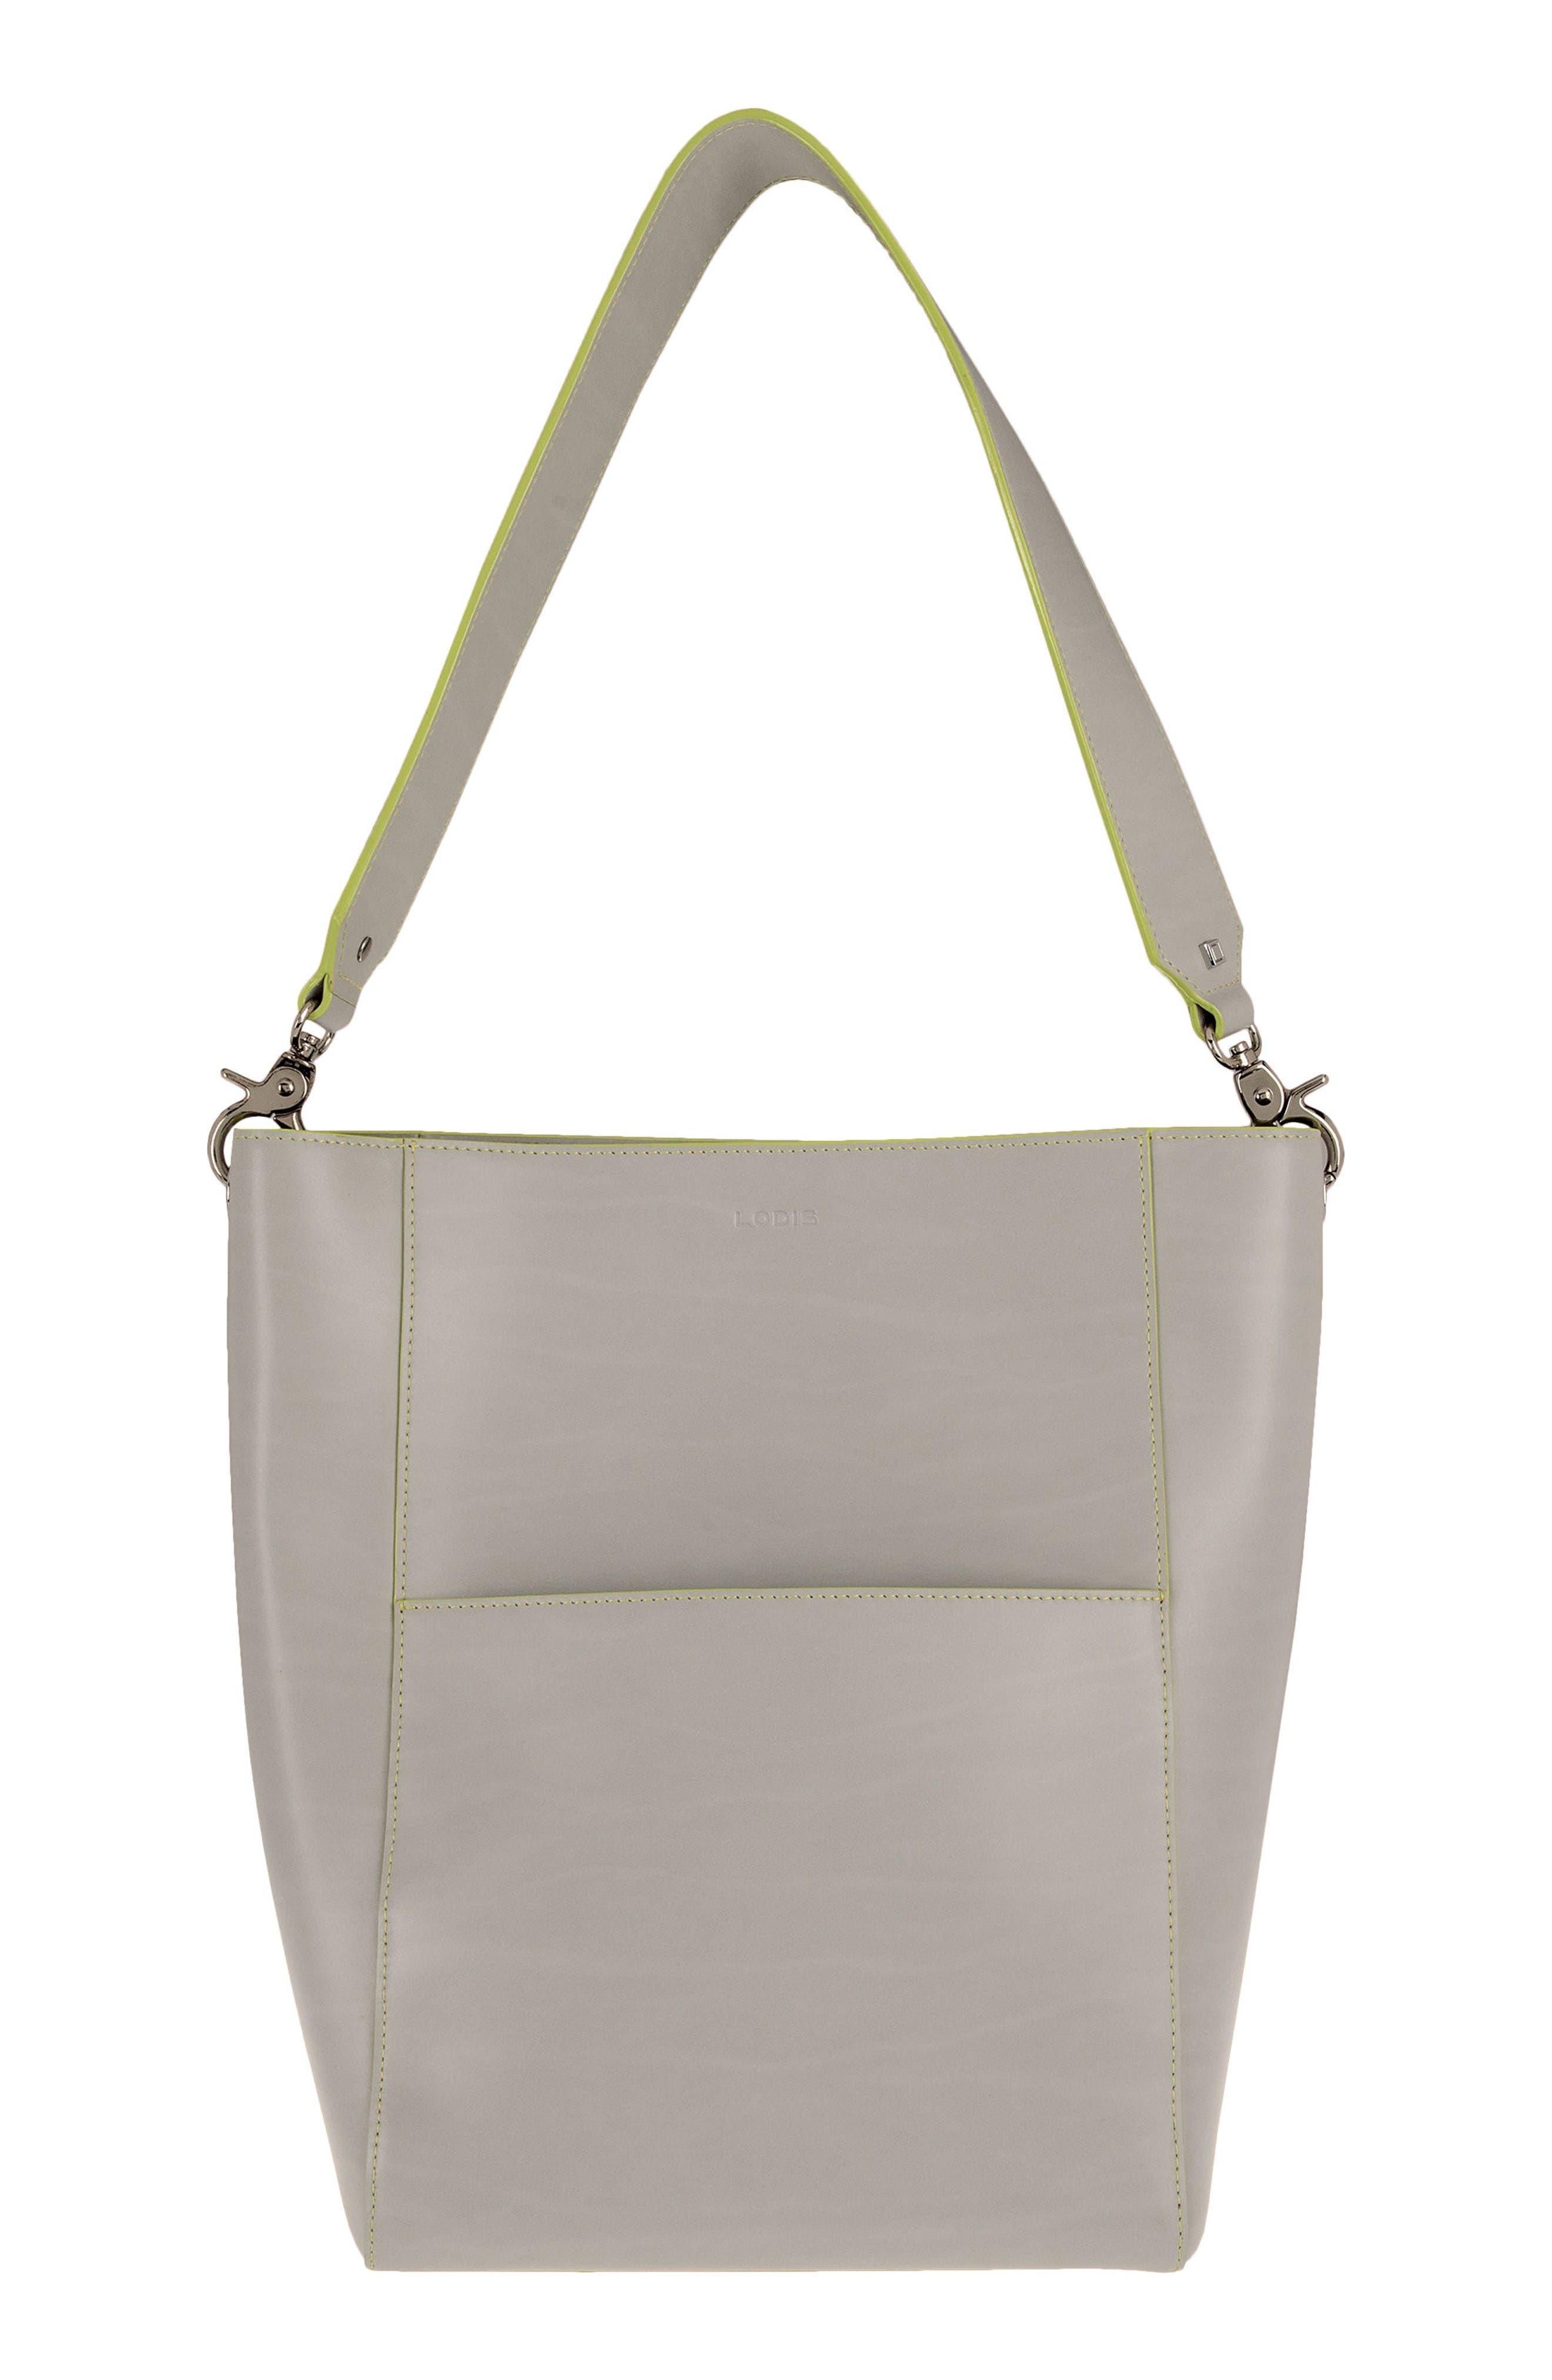 LODIS Berta Leather Bucket Bag